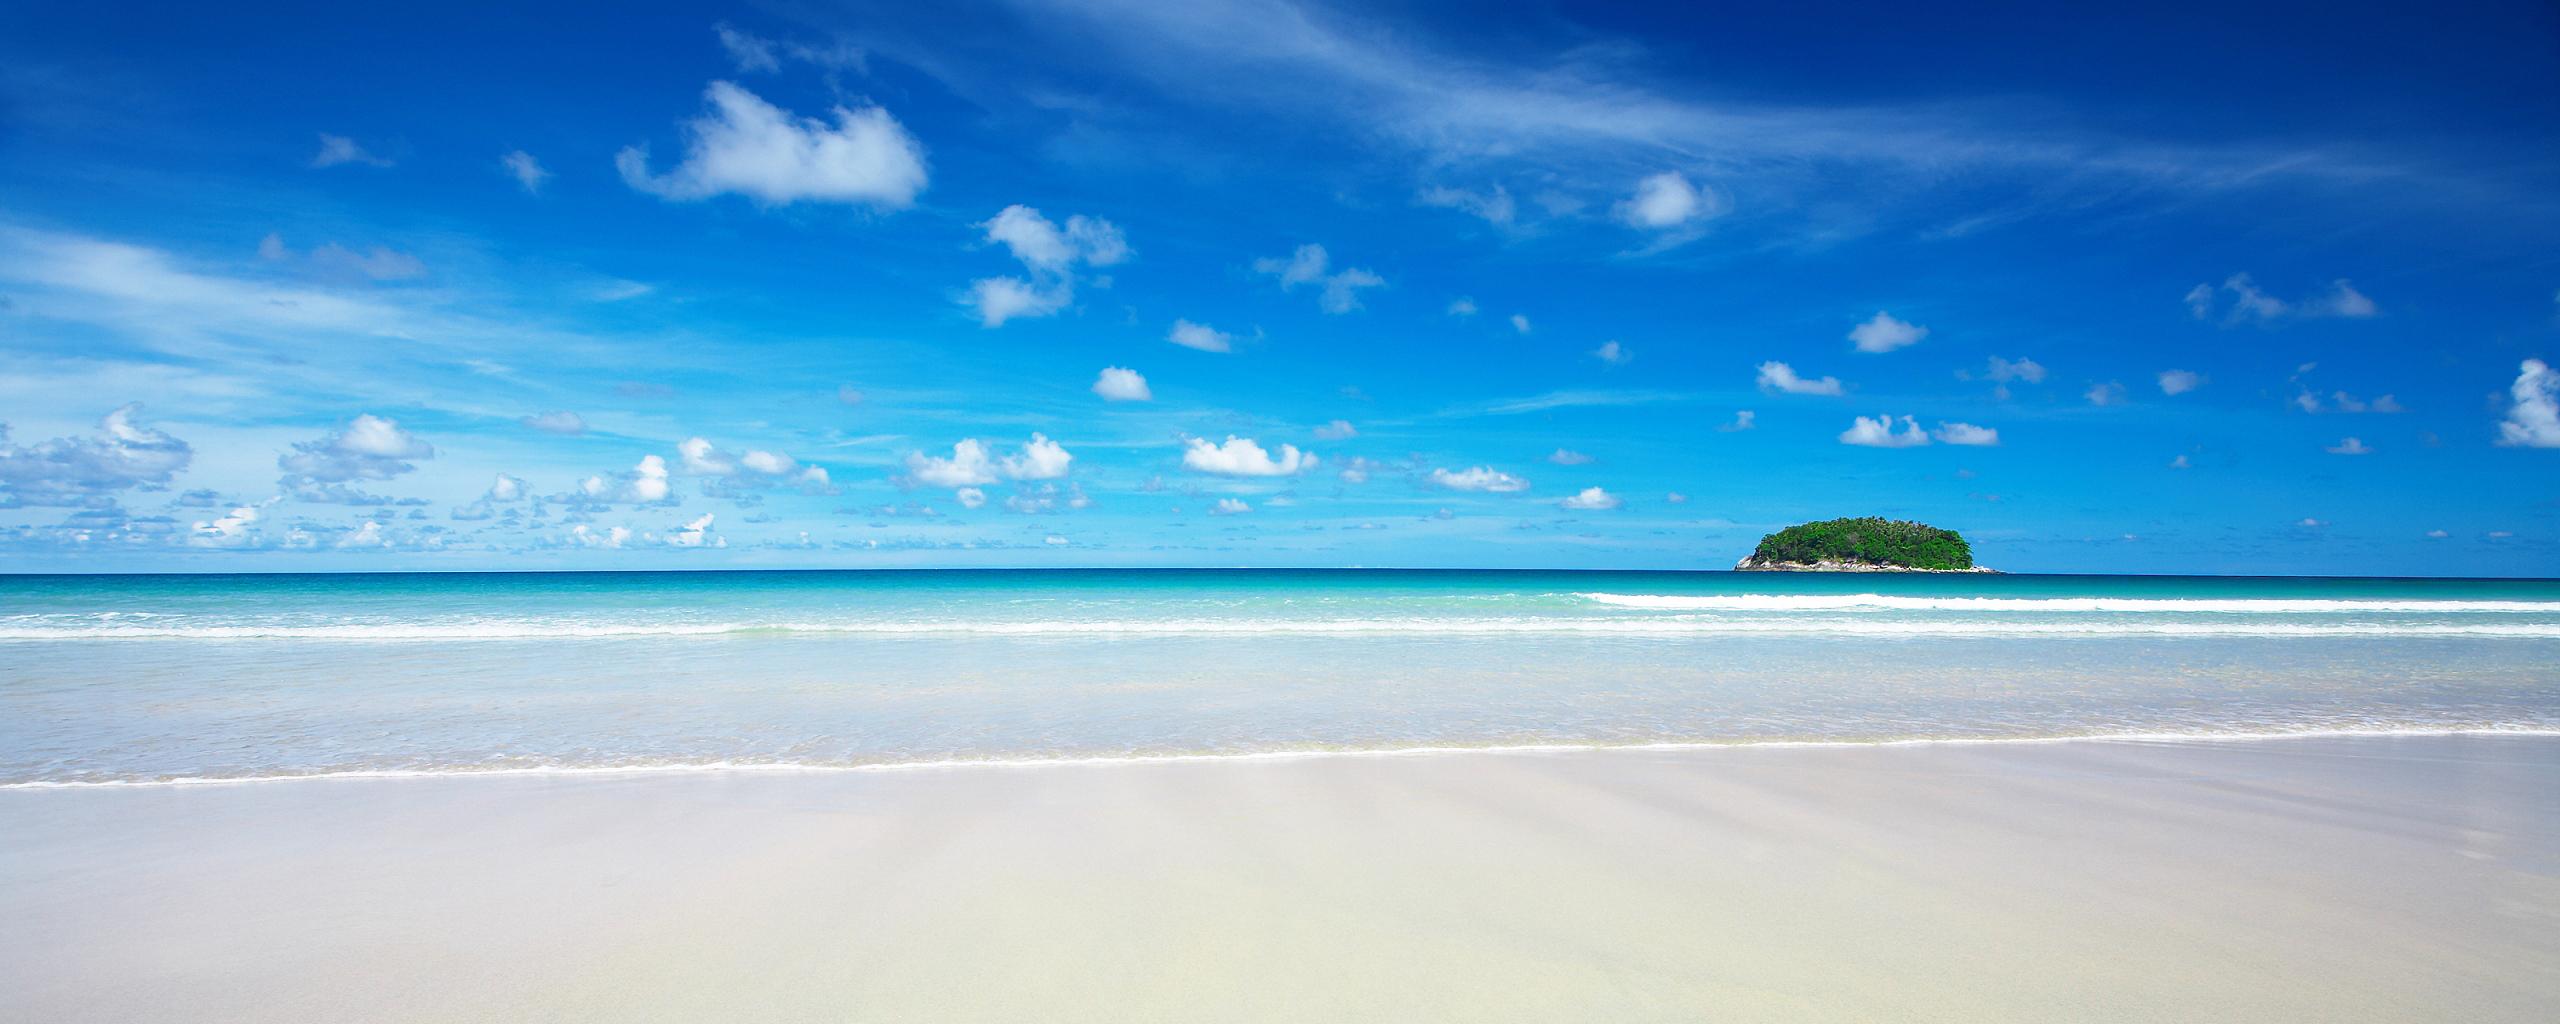 пляж, пляжный Paradise